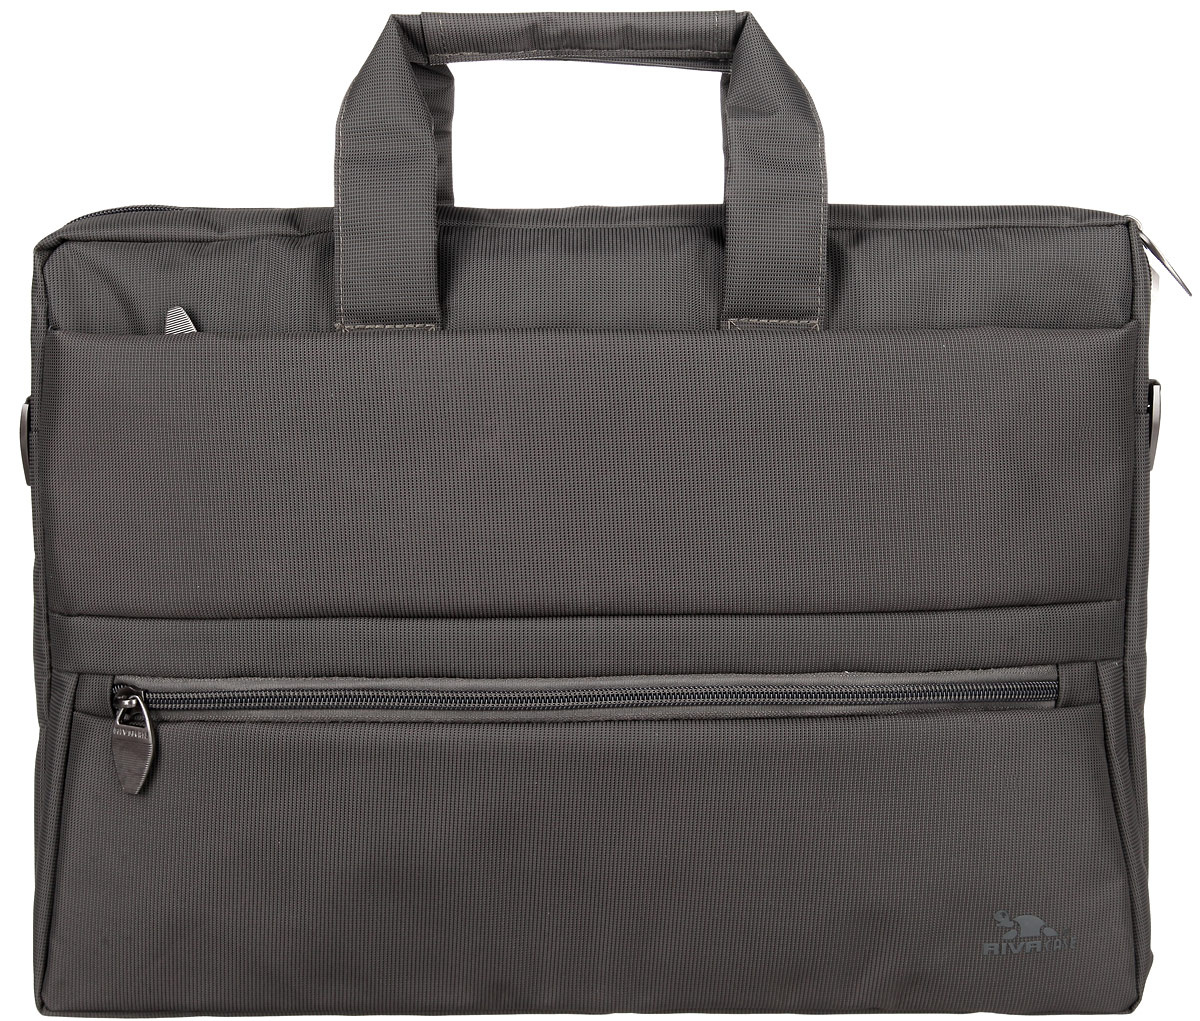 493c7c7da2e9 RIVACASE 8630 сумка для ноутбука 15,6